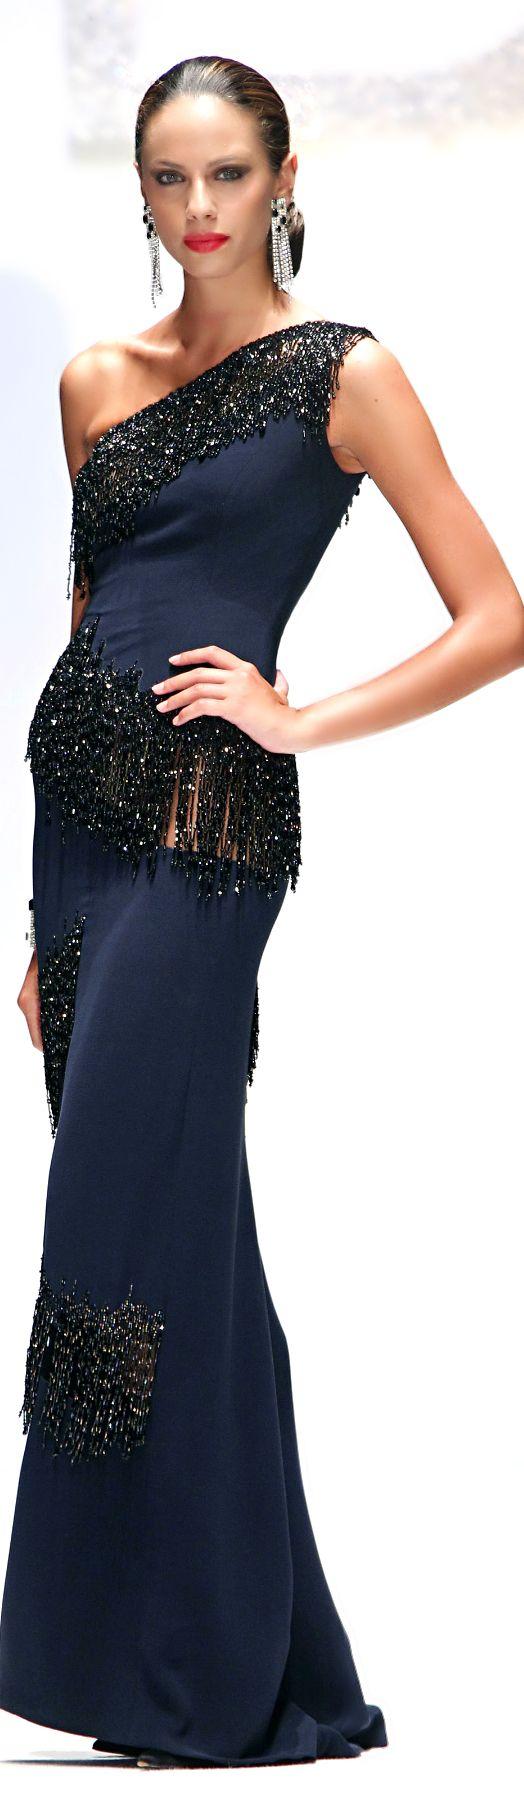 Renato Balestra Couture Gown